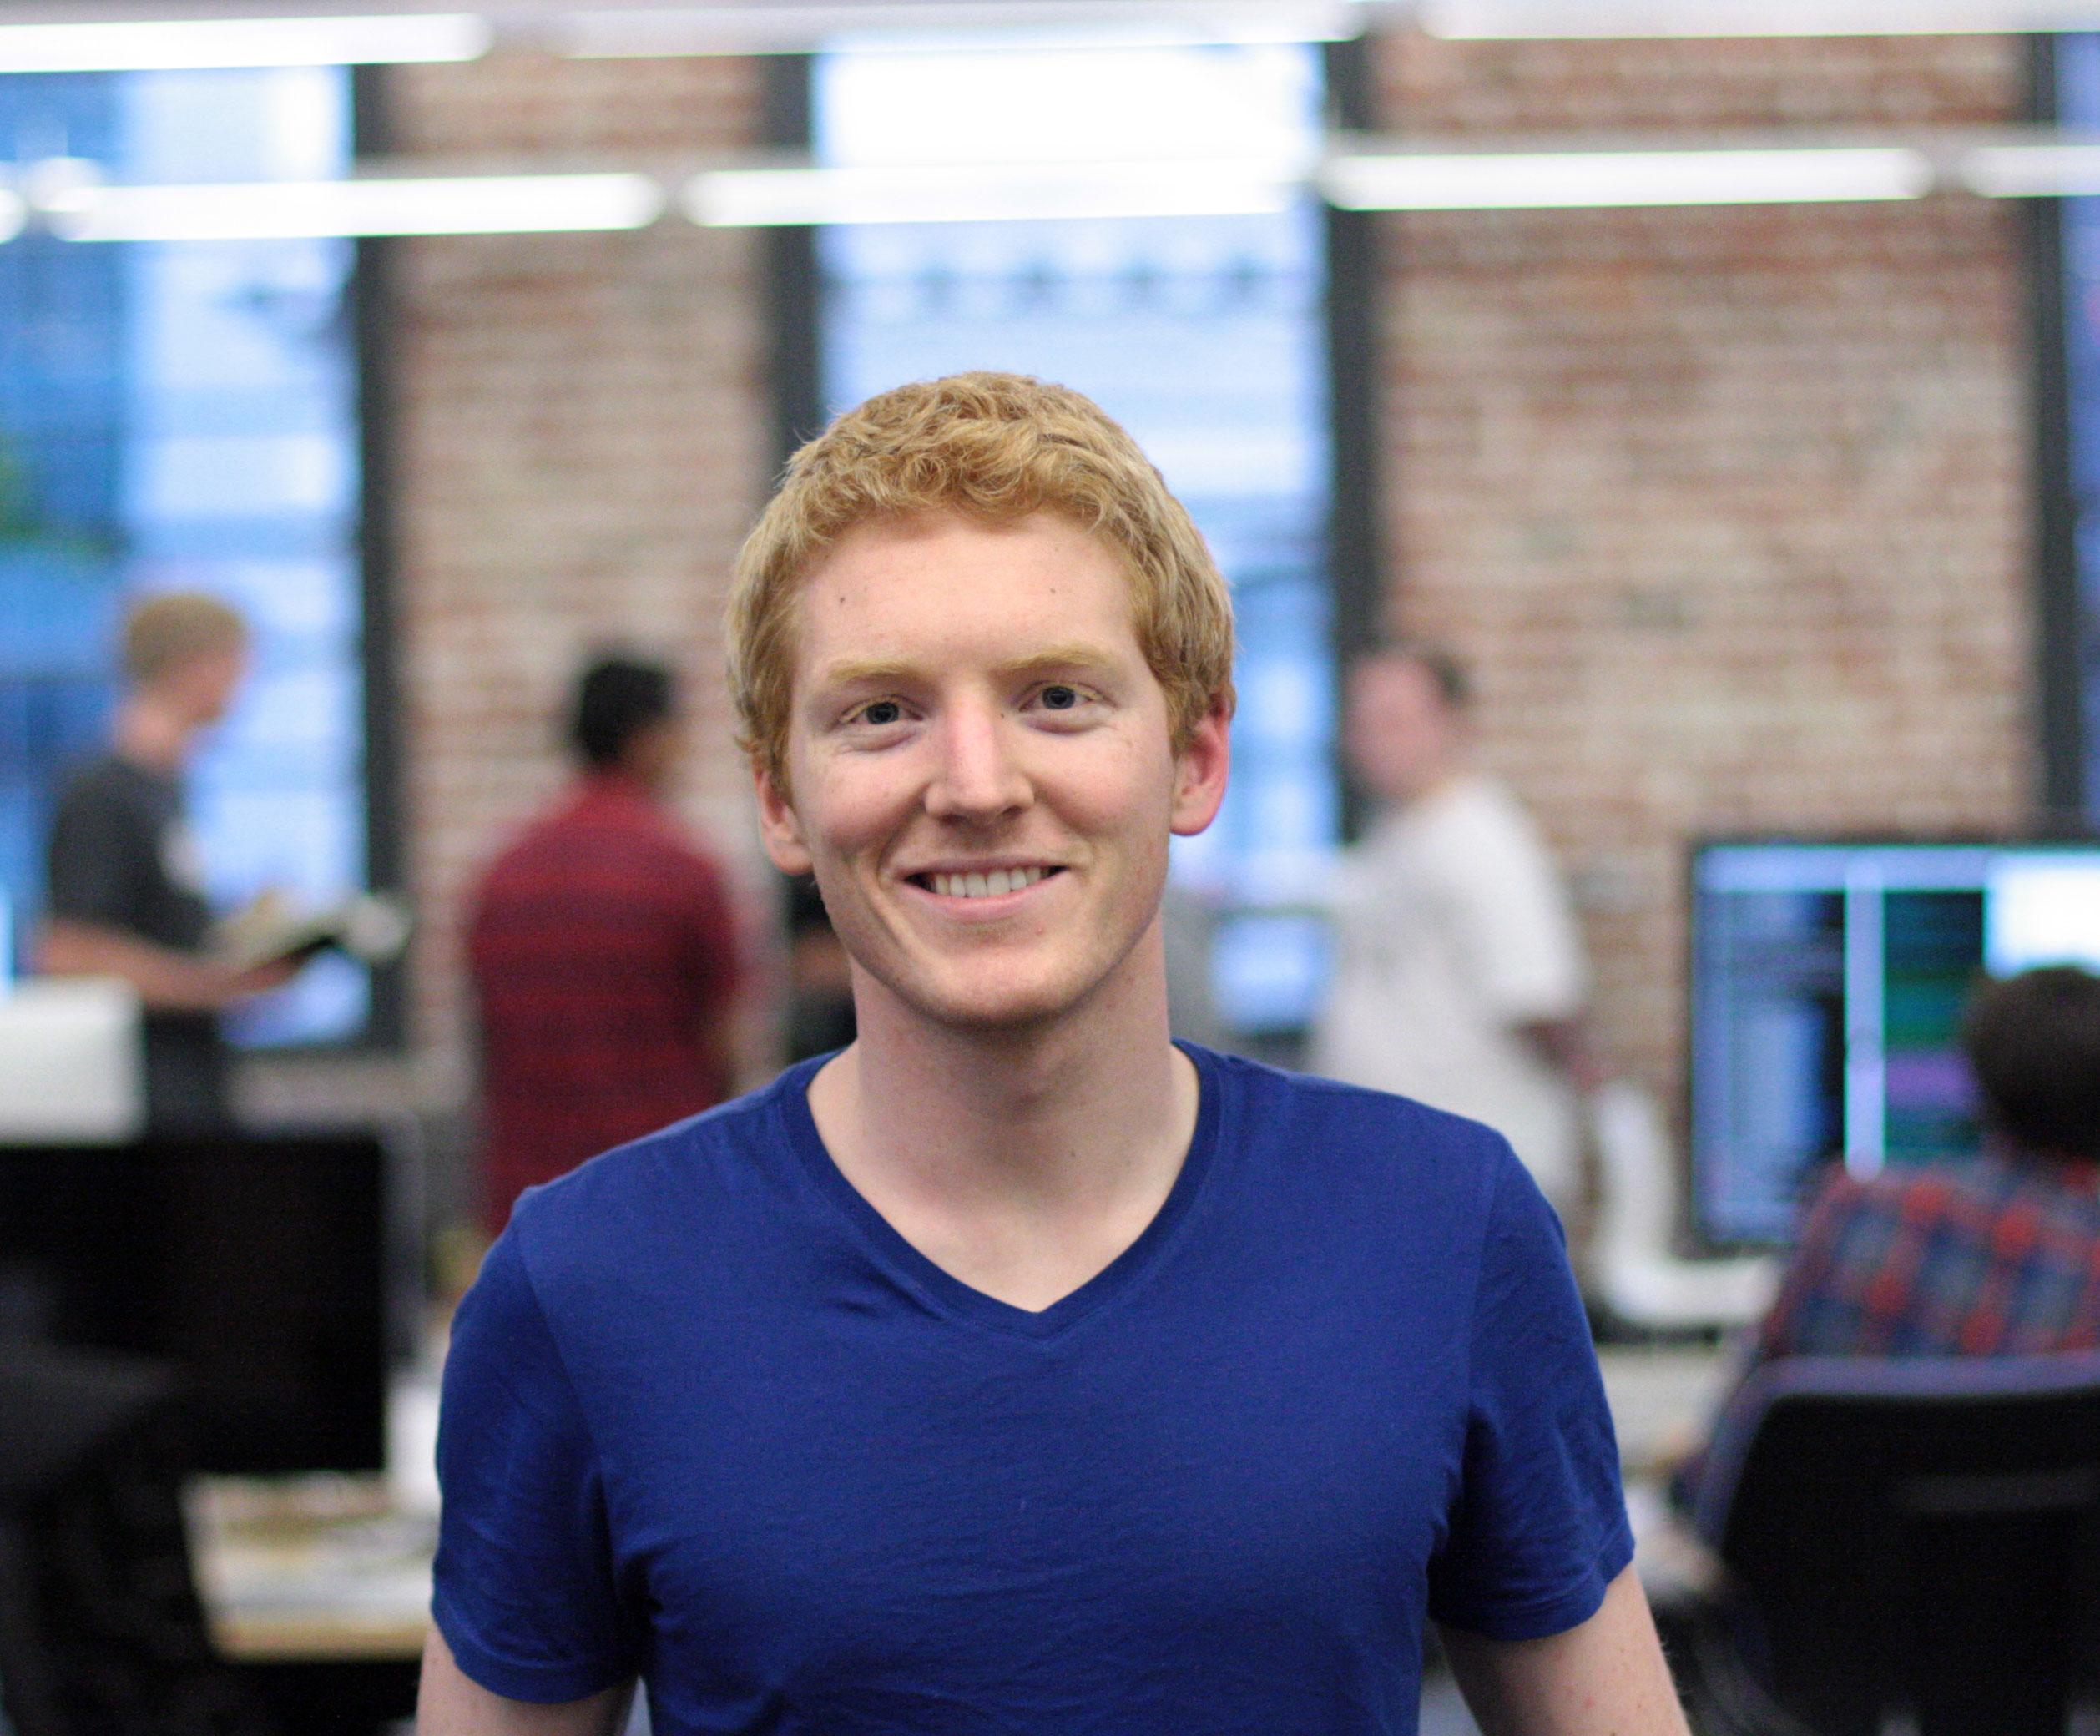 Stripe co-founder Patrick Collison